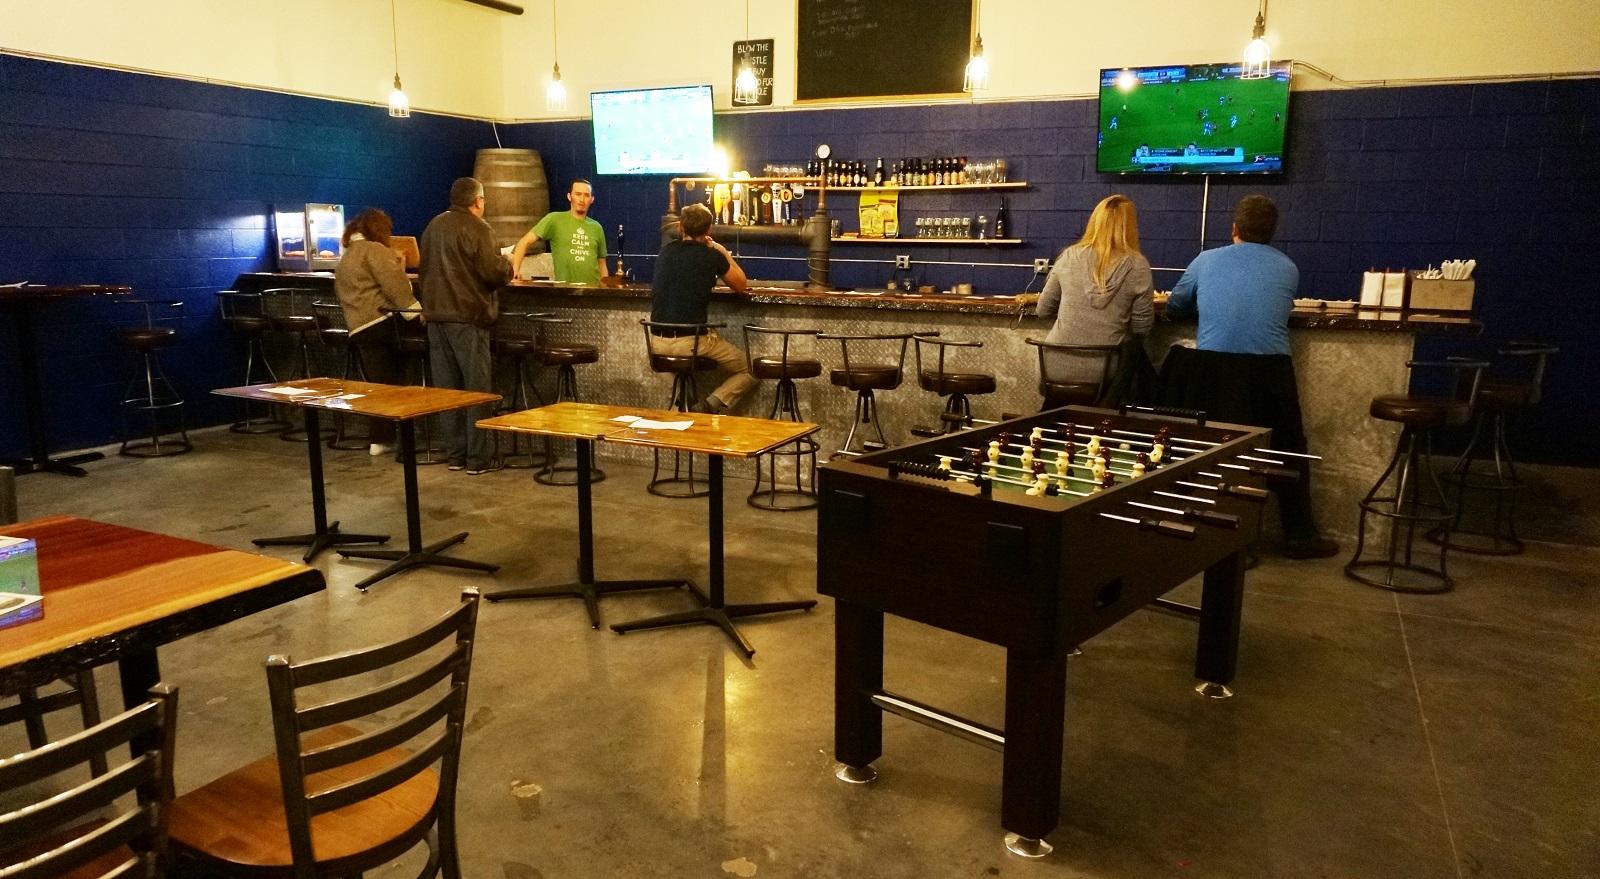 A look inside Parker's newest unveiling, the Pitch Bar. (Joe Popiolkowski/Buffalo News)